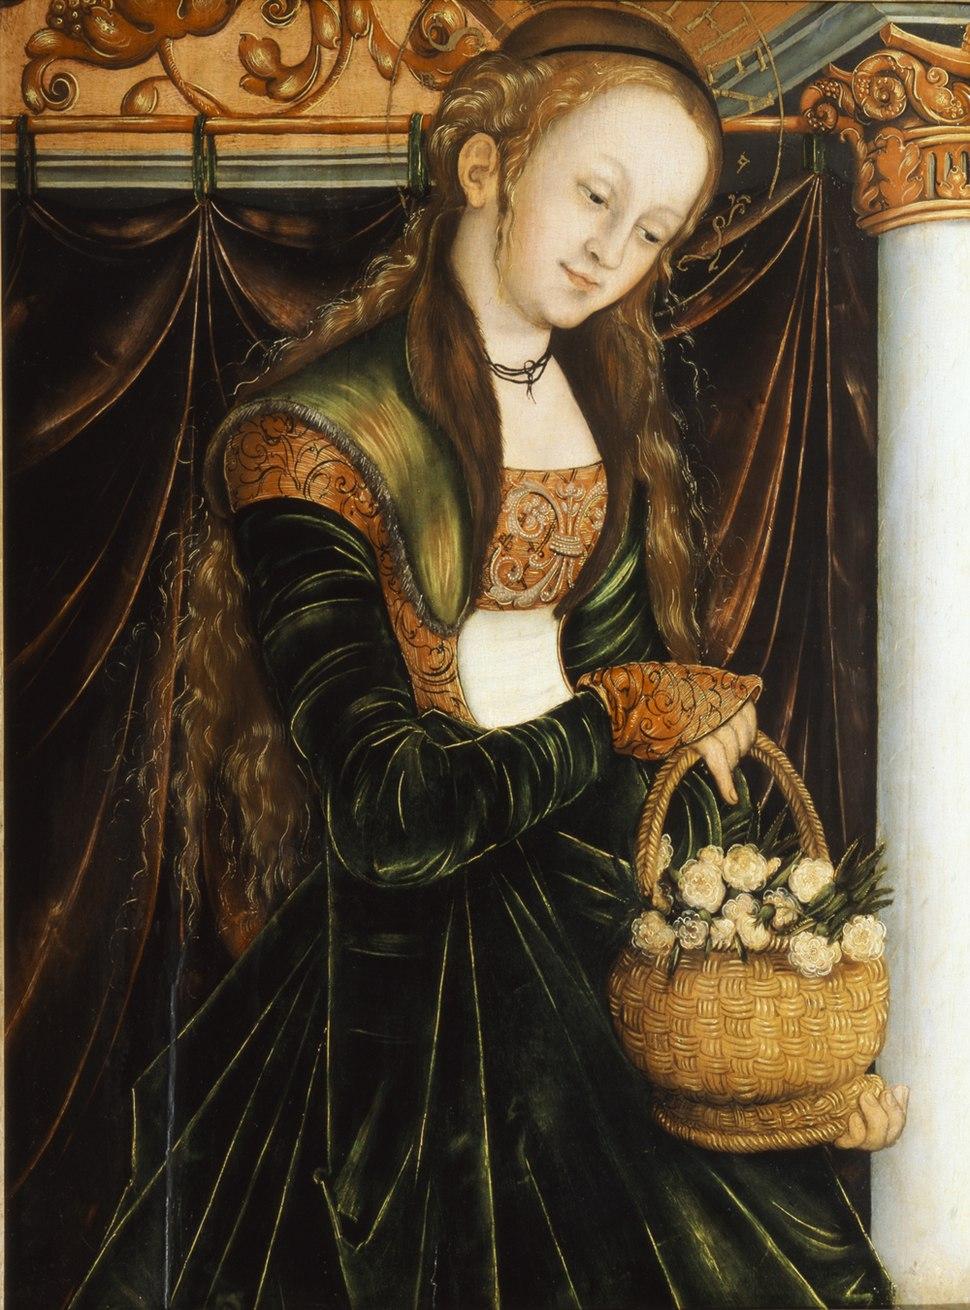 Cranach, Lucas, d.%C3%84. - Die Heilige Dorothea - c. 1530